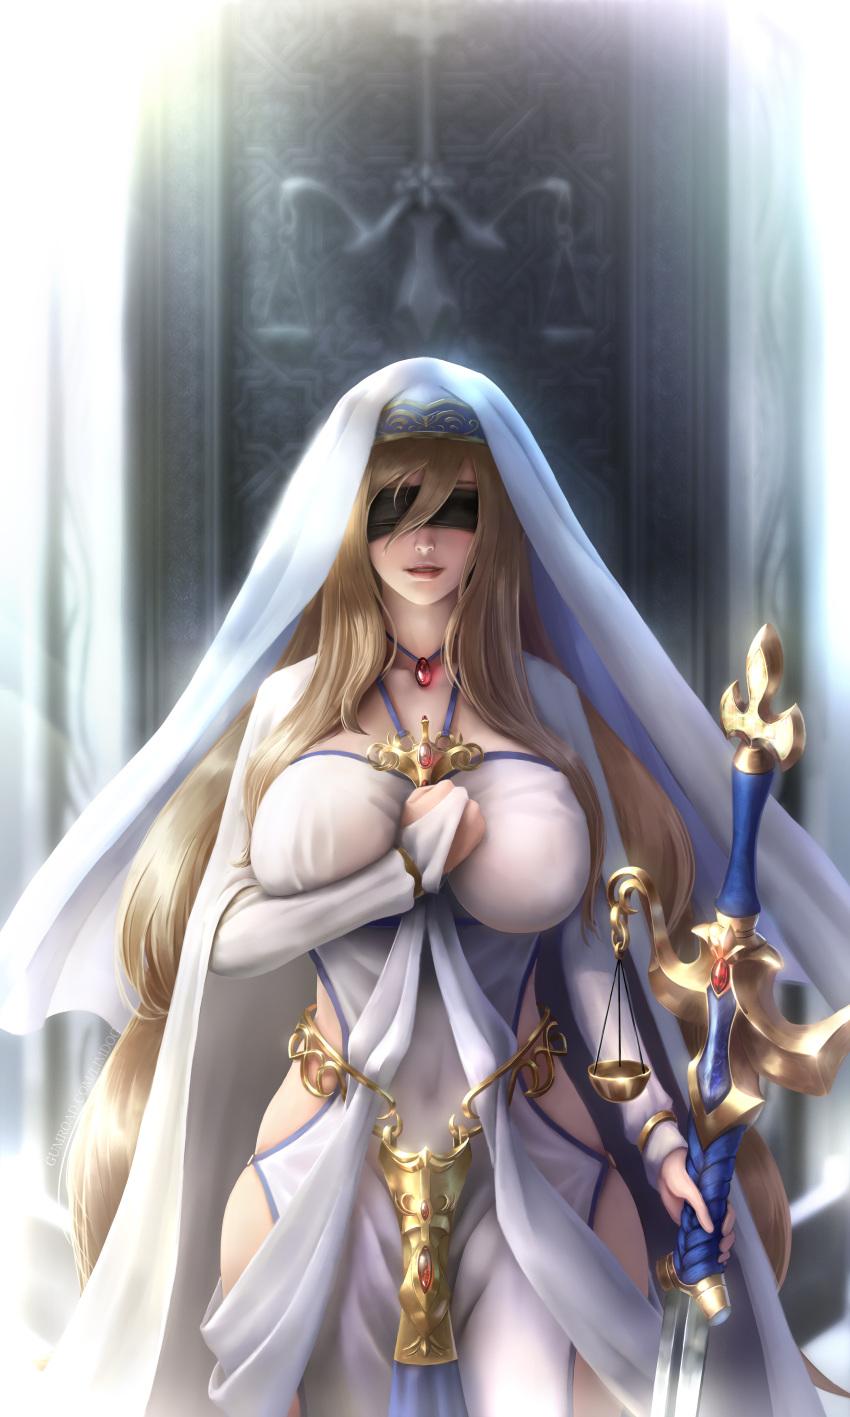 sword maiden of azure dragon Ed edd n eddy marie nude